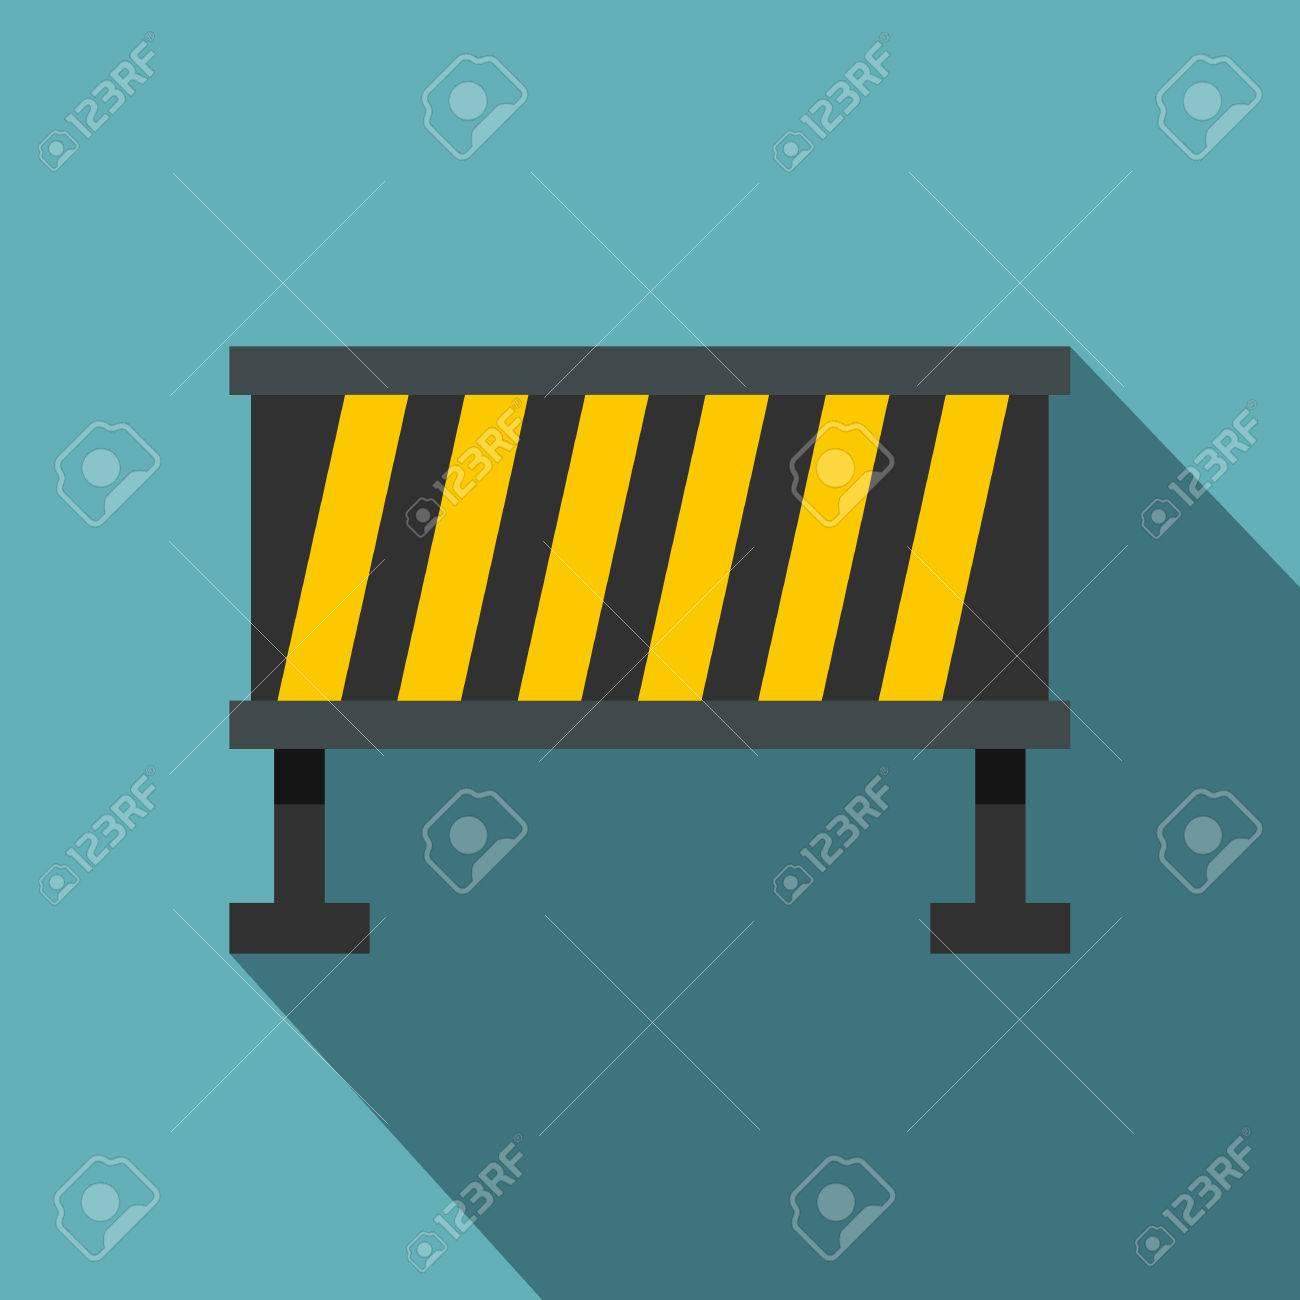 Safety Barricade Icon Flat Illustration Of Safety Barricade